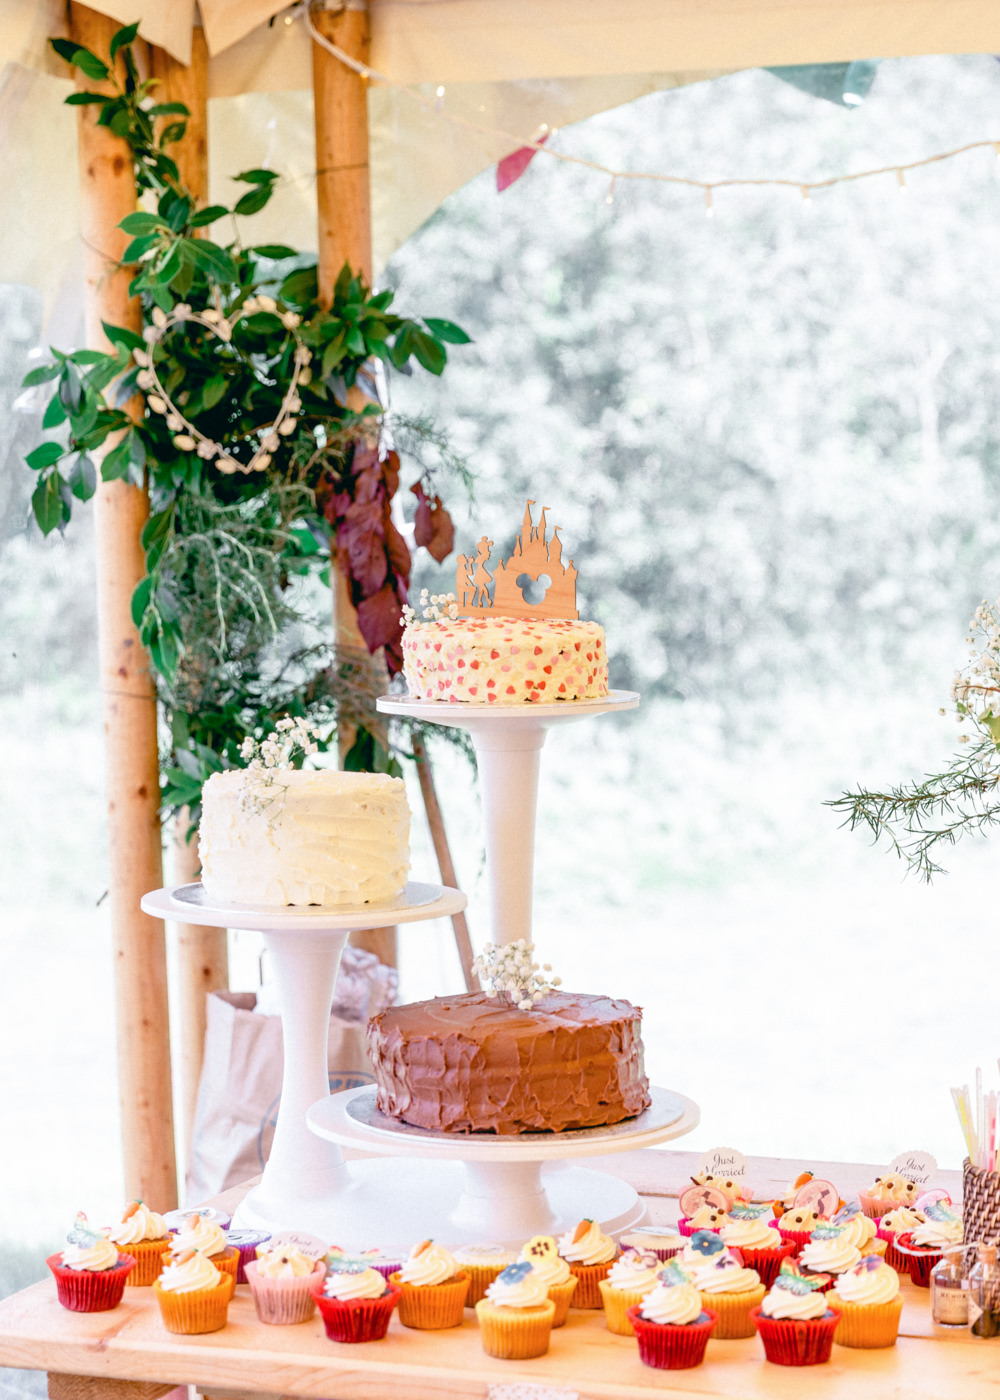 Cakes Cake Stand Cupcakes Teybrook Orchard Wedding Hayley Jaynes Photography